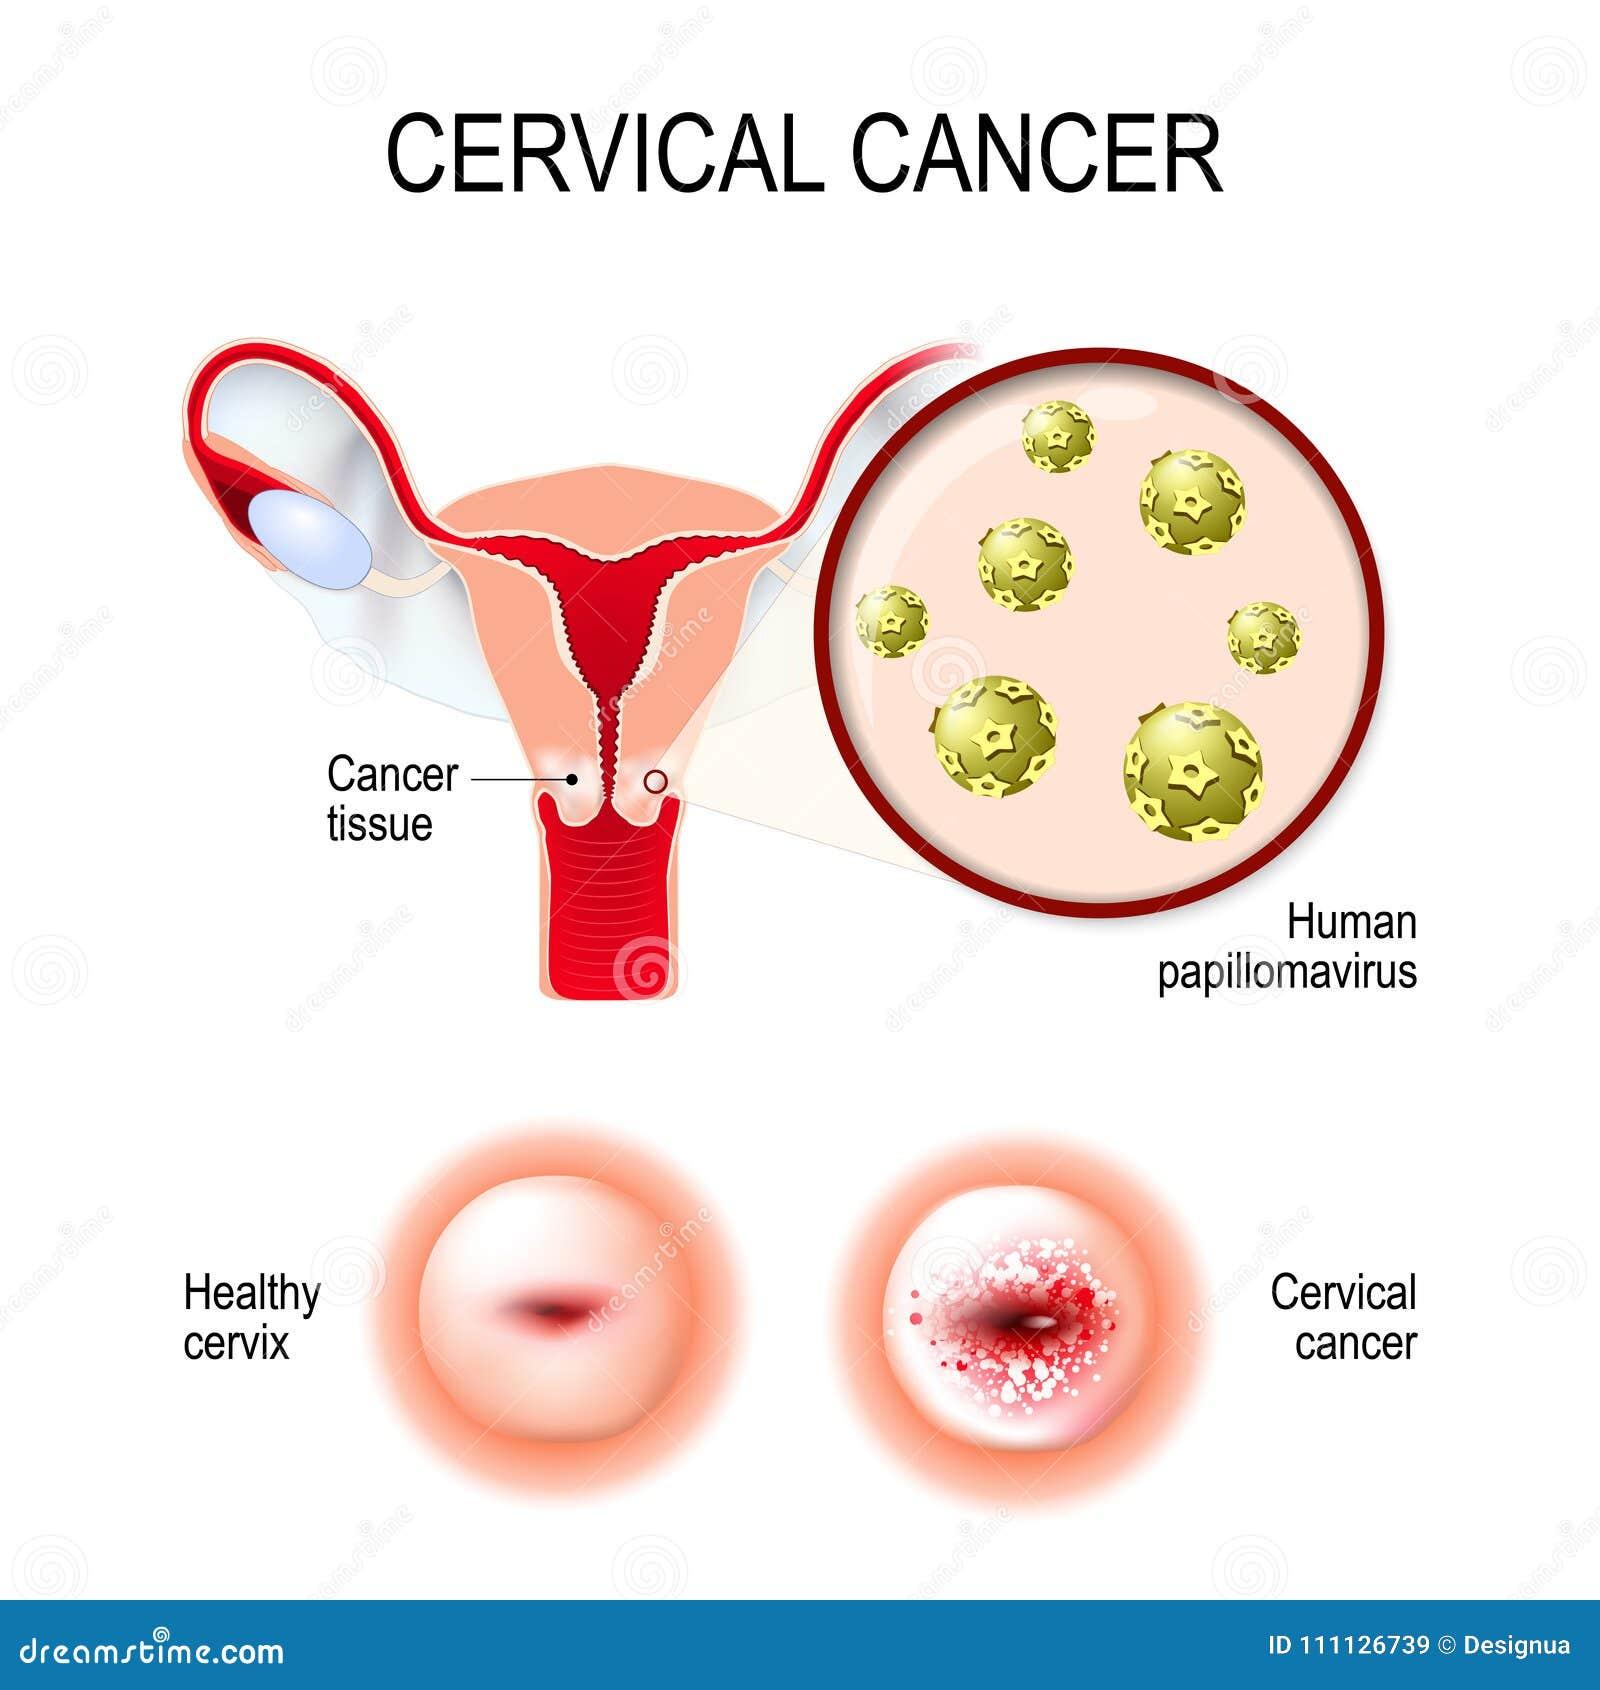 wart virus on cervix a toxine definition